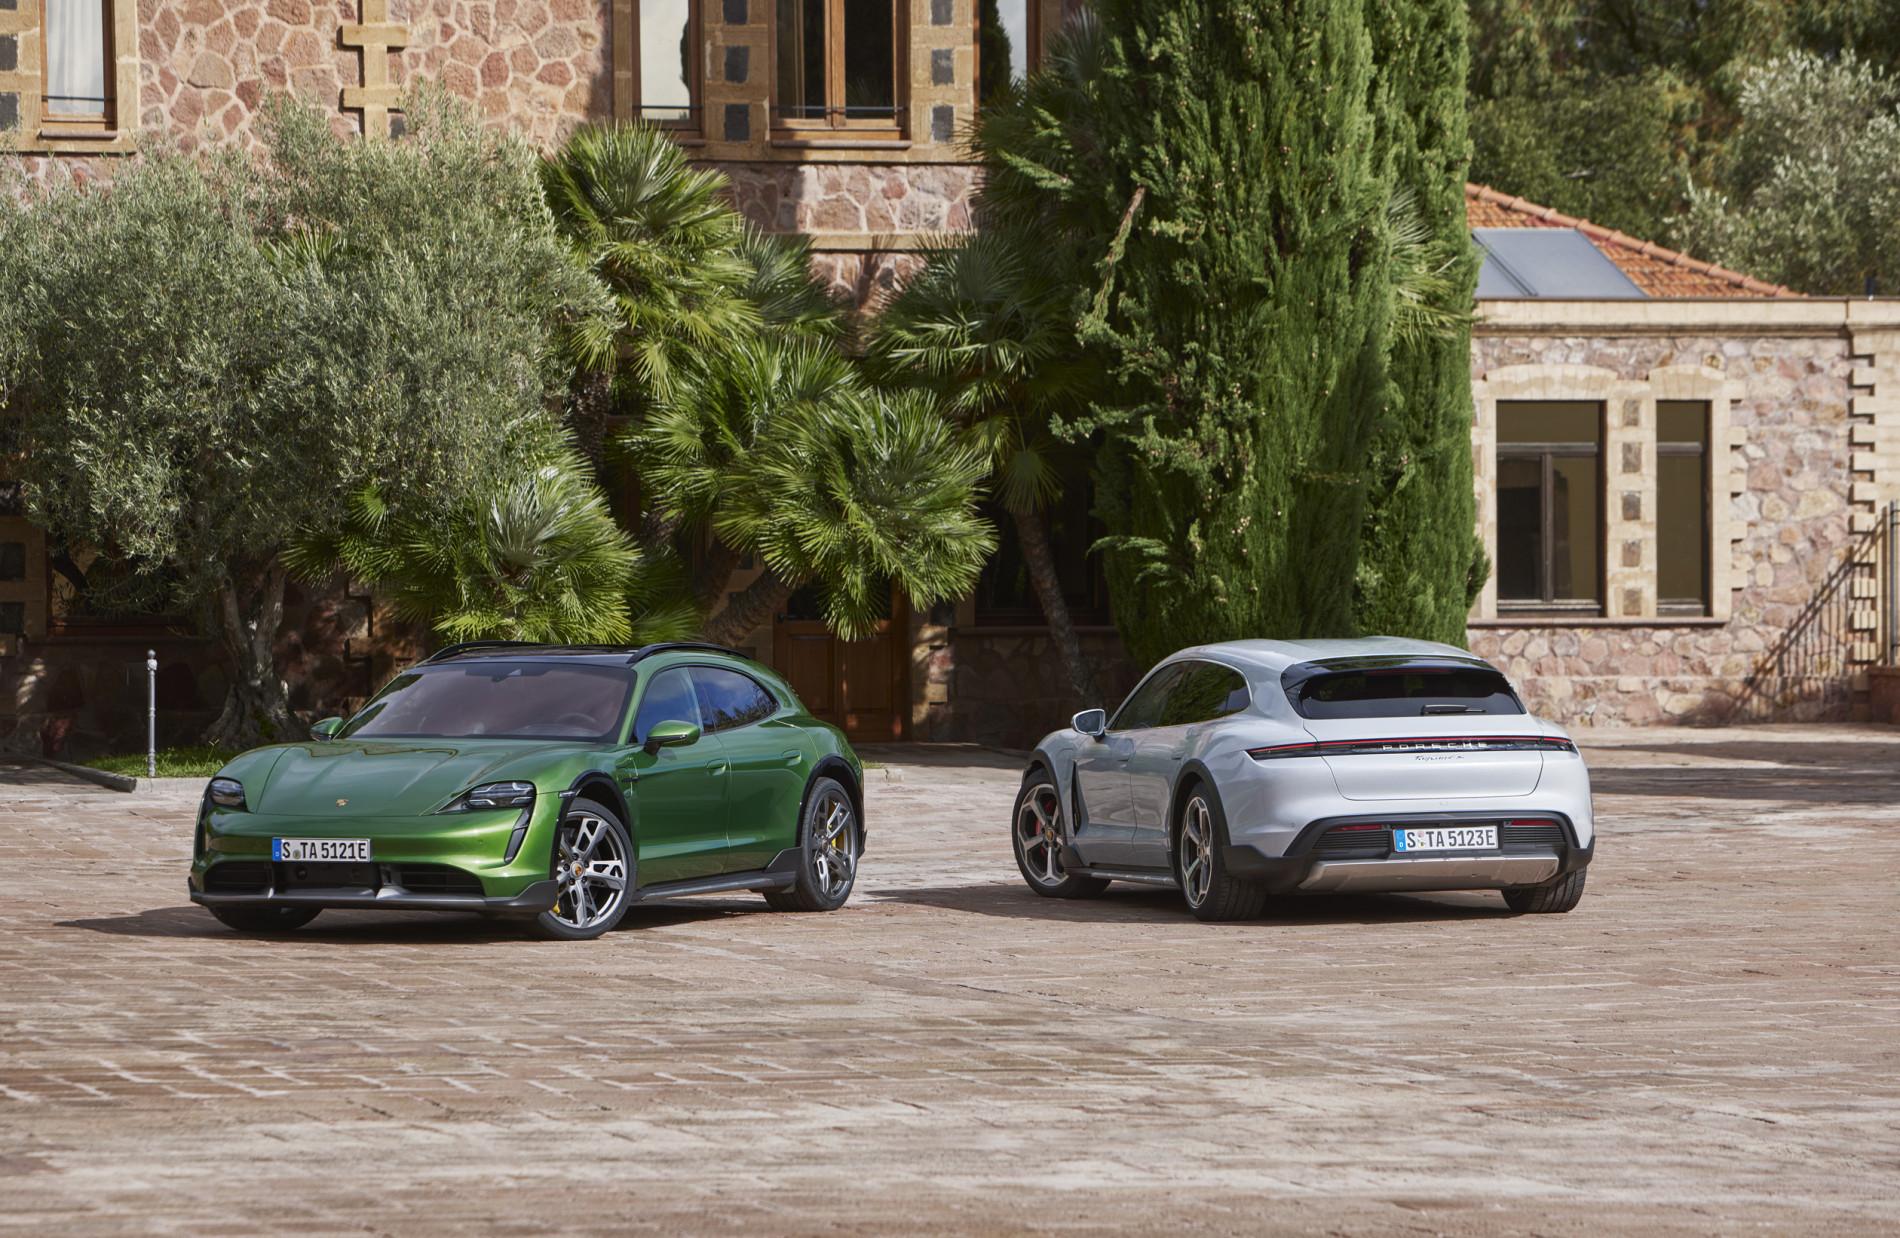 Porsche Taycan Cross Turismo - Porsche Taycan Cross Turismo